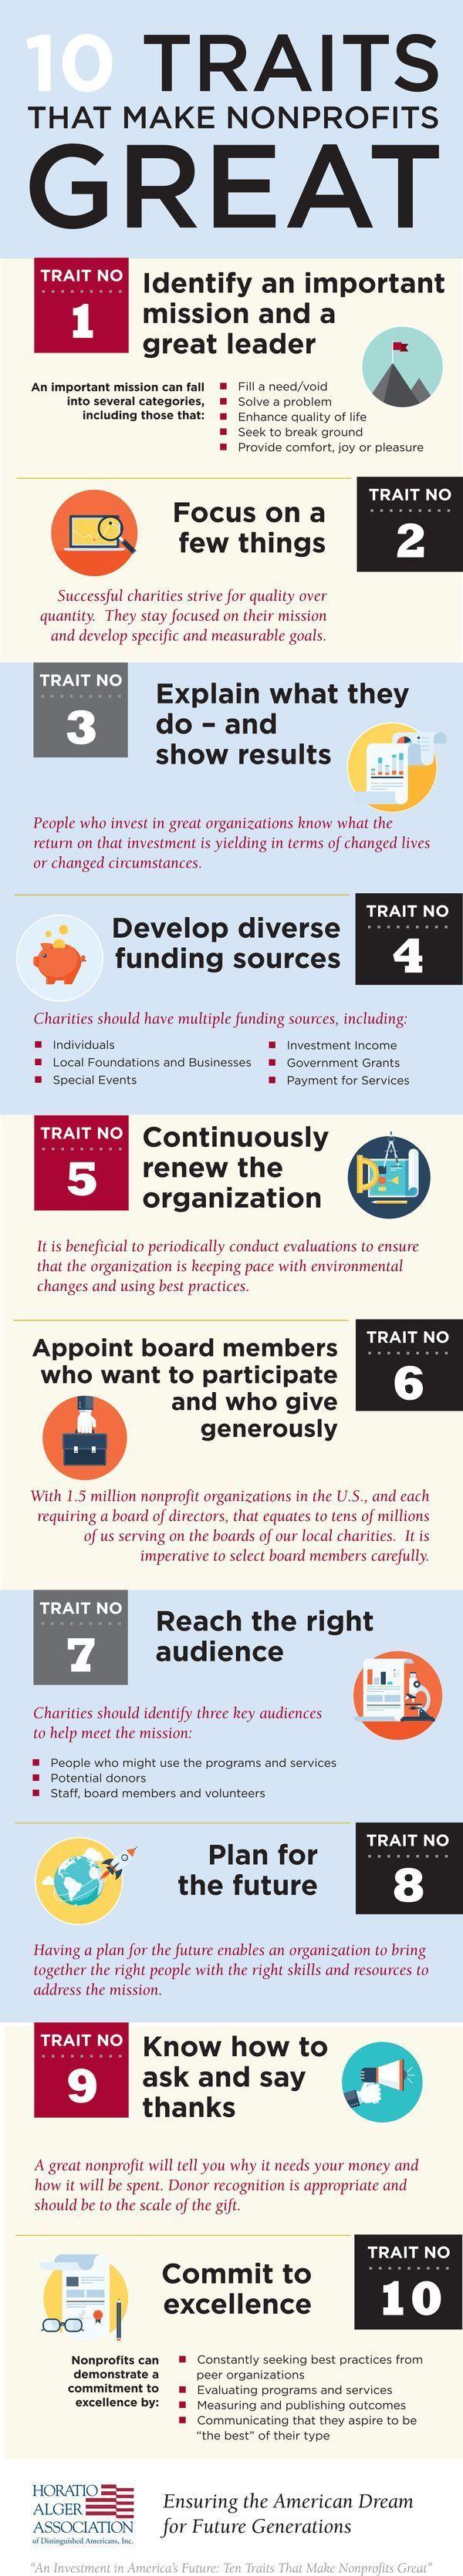 10 Traits Infographic